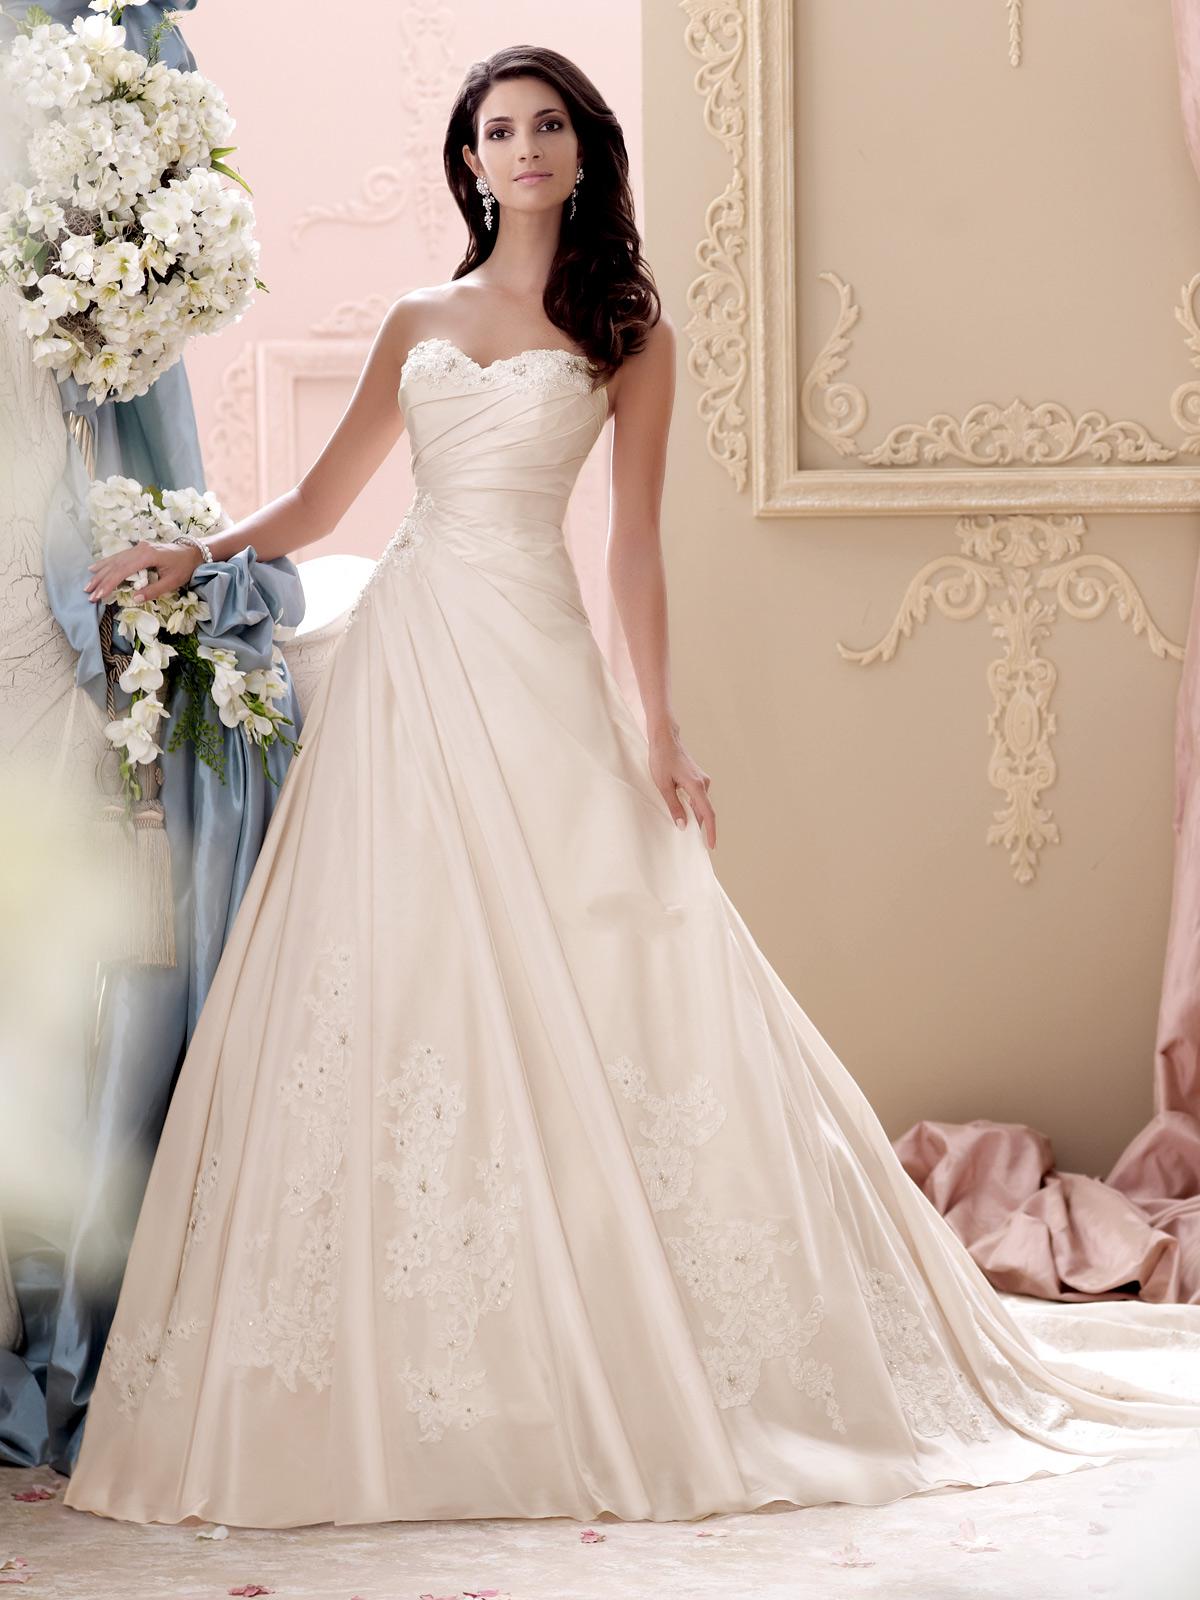 pinkishbluishgreenish otherwise not white wedding gowns wedding gowns PInkish Bluish Greenish otherwise NOT WHITE wedding gowns